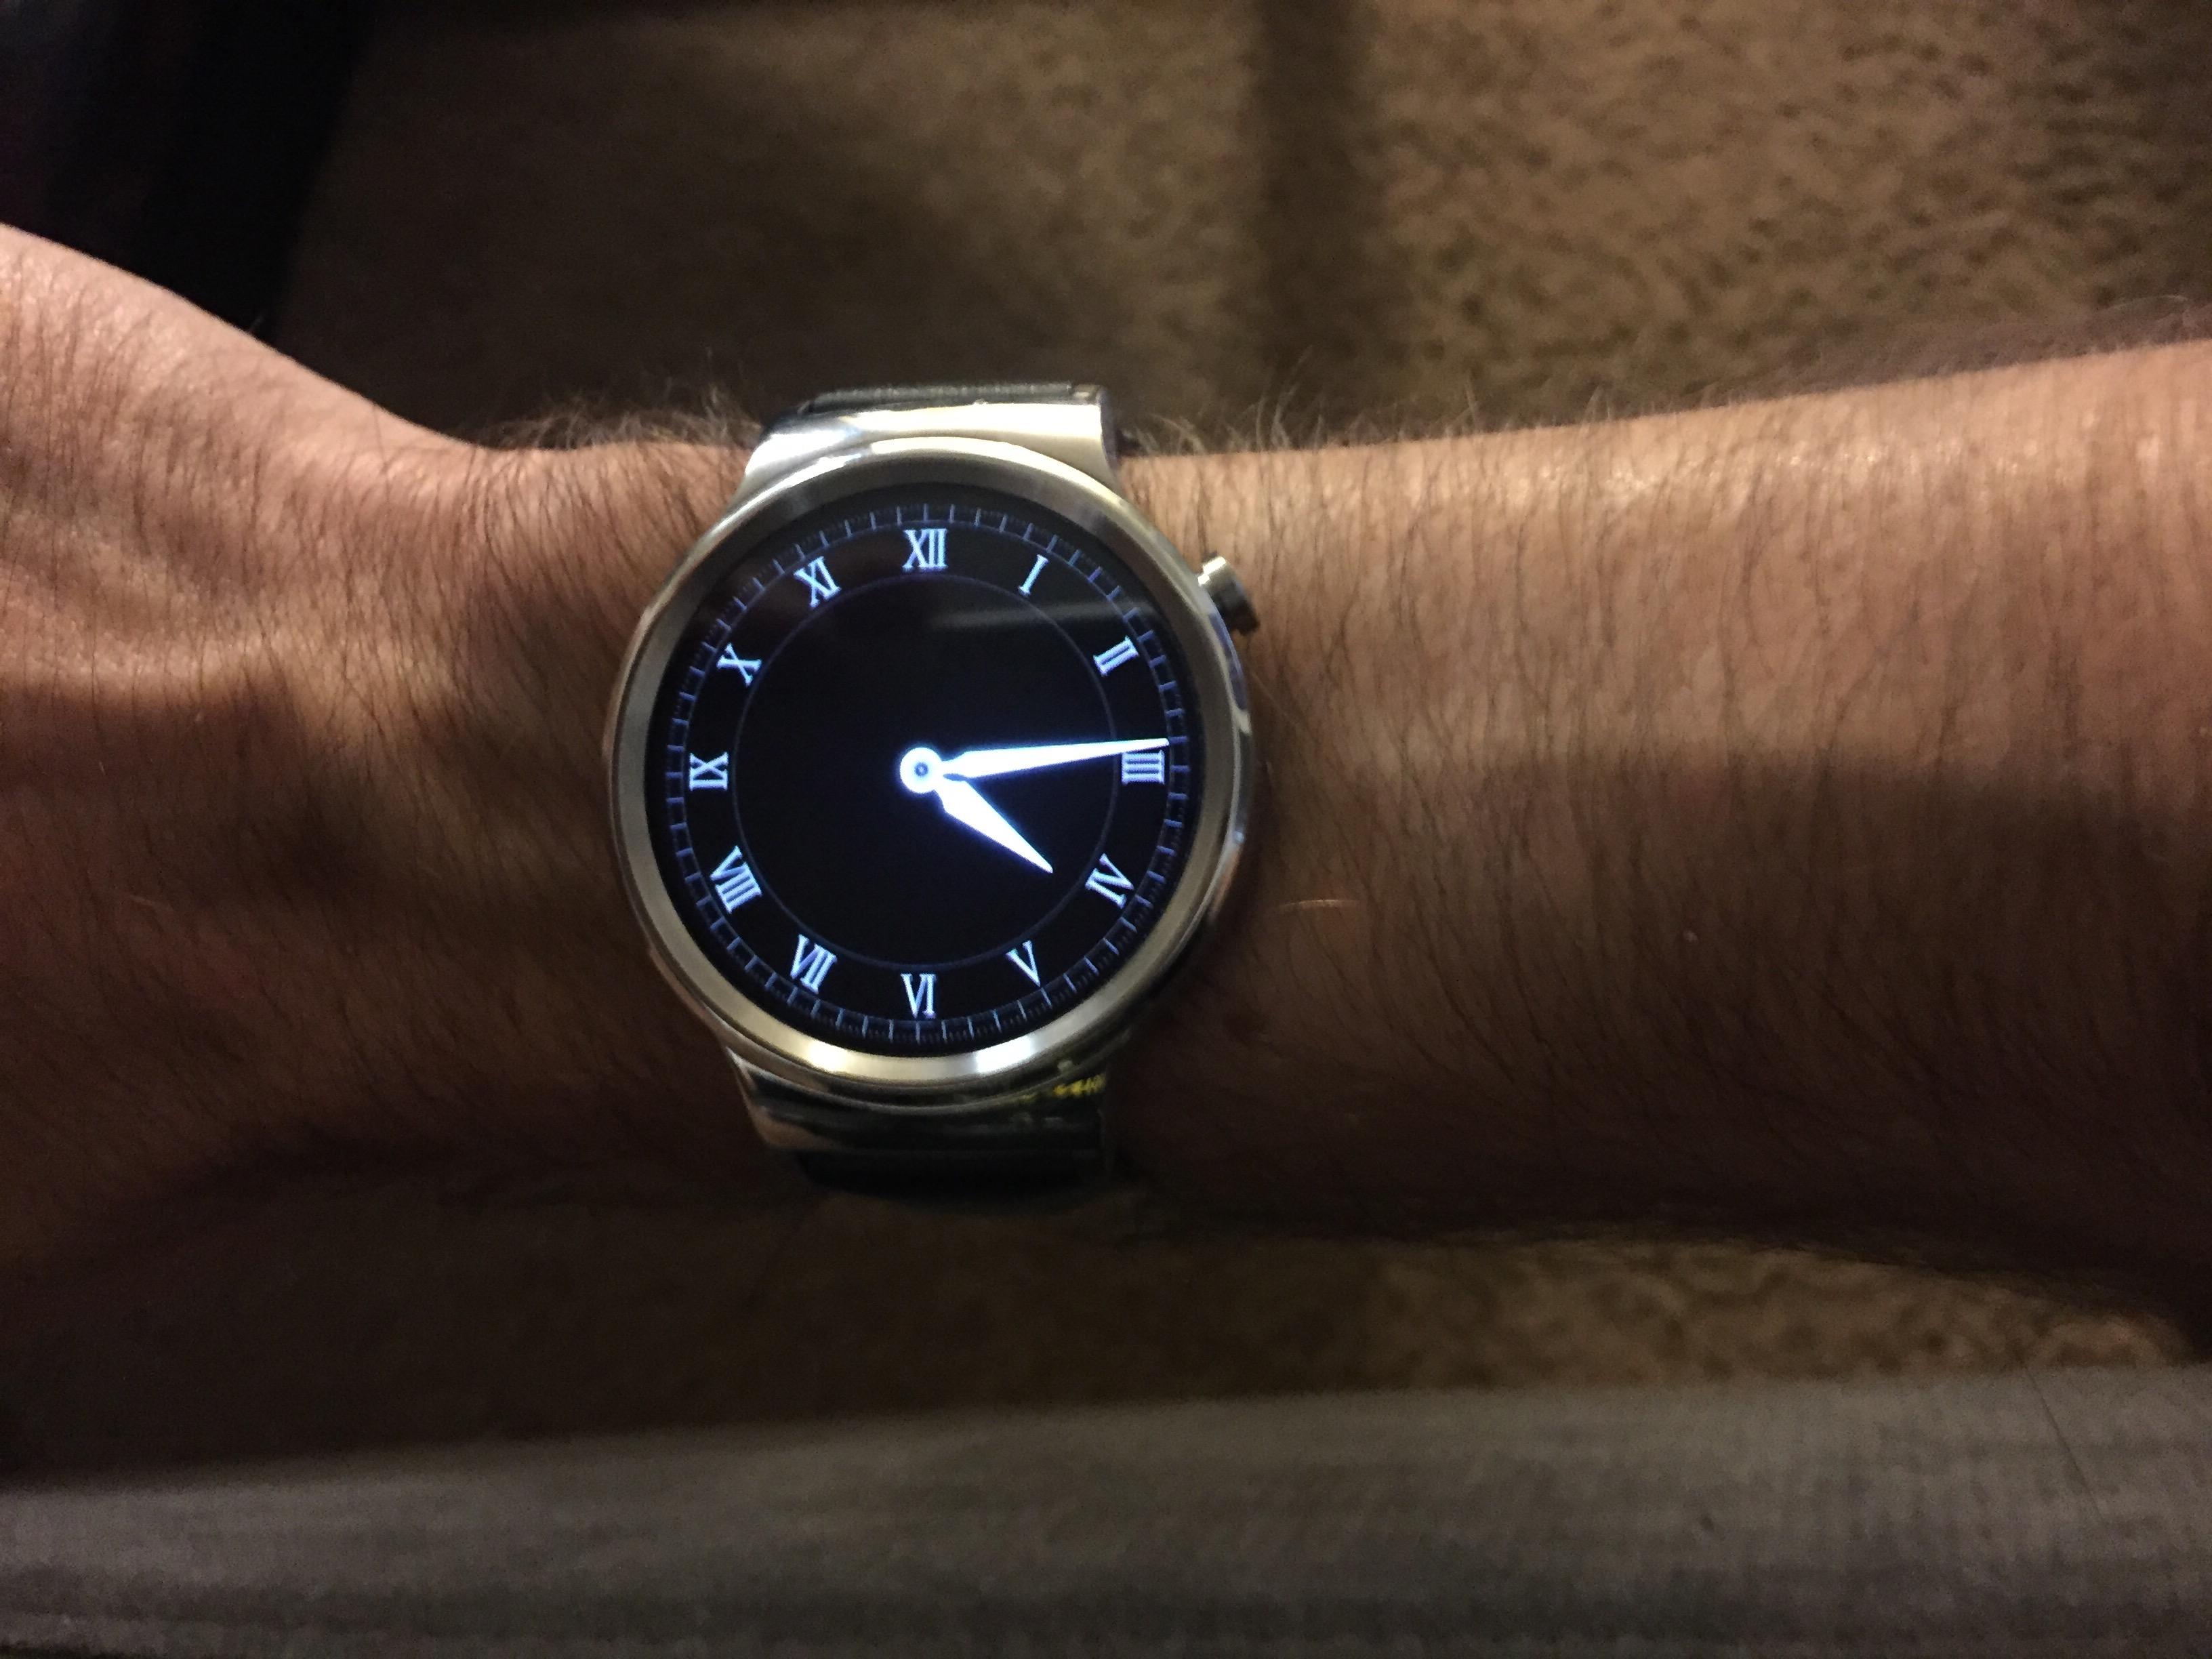 Huawei Watch, meet Willie arm.